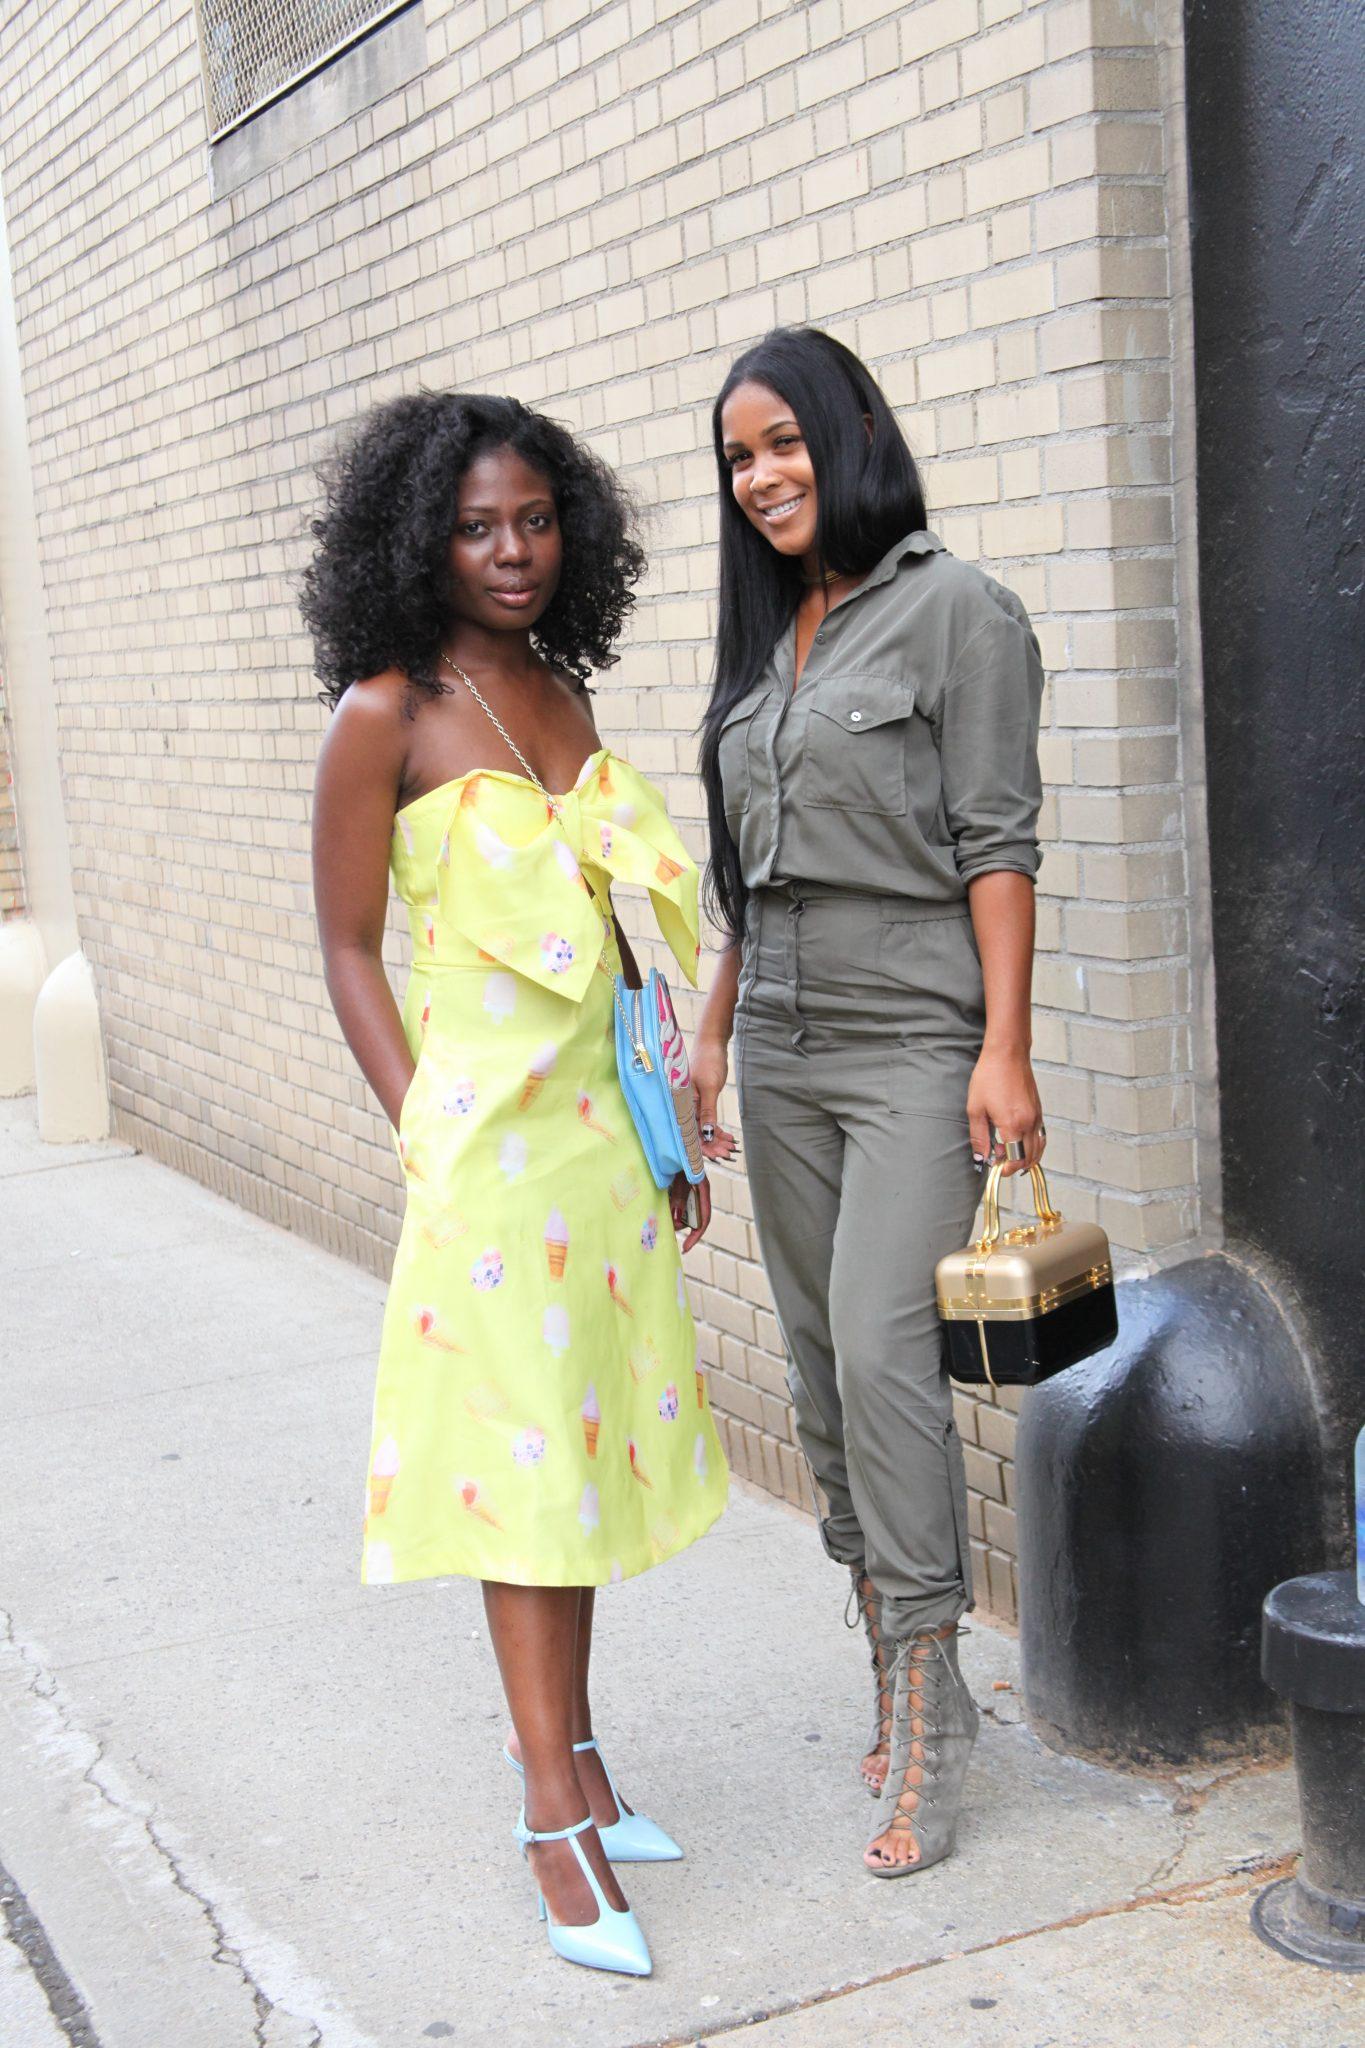 New York City Street Style: New York Fashion Week #NYFW